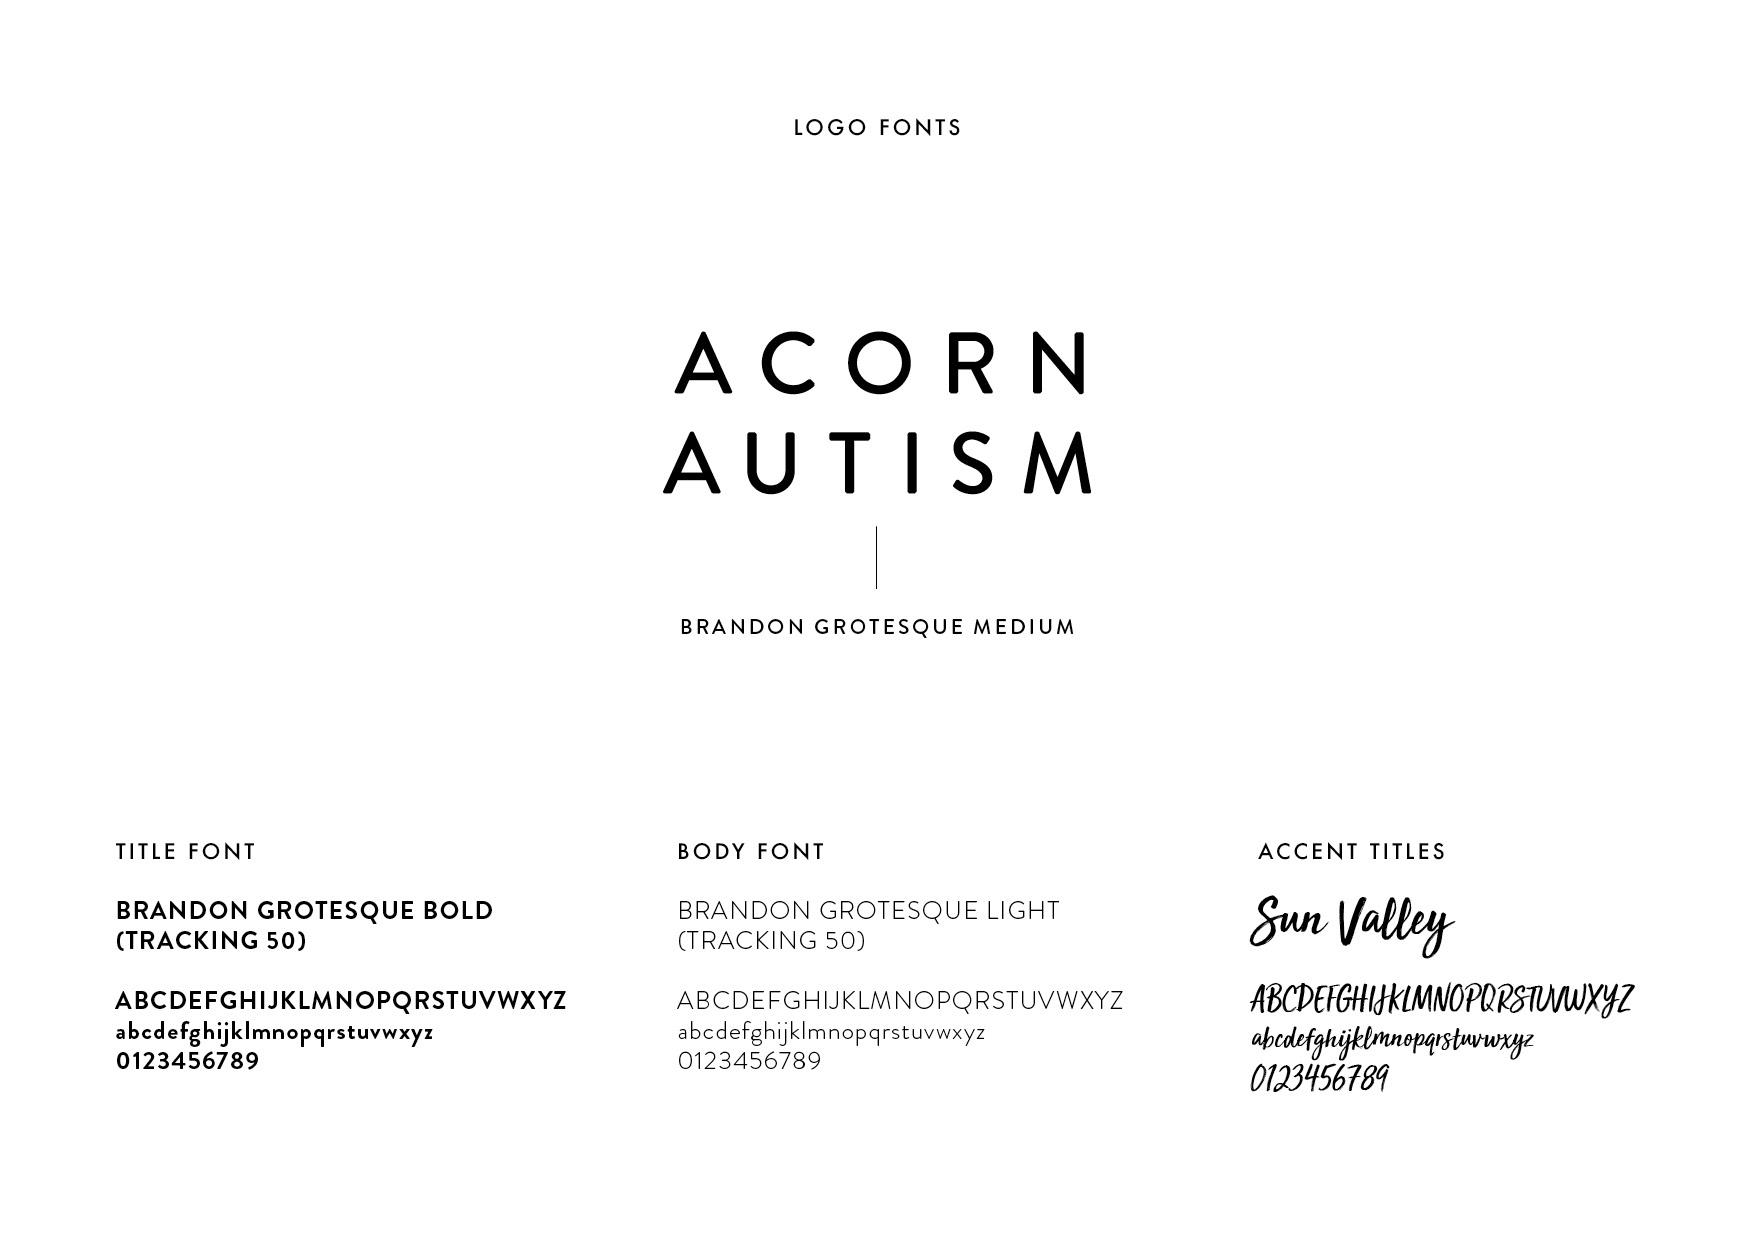 Rochelle-Vranjes-Acorn-Autism-Branding-Guidelines6.jpg